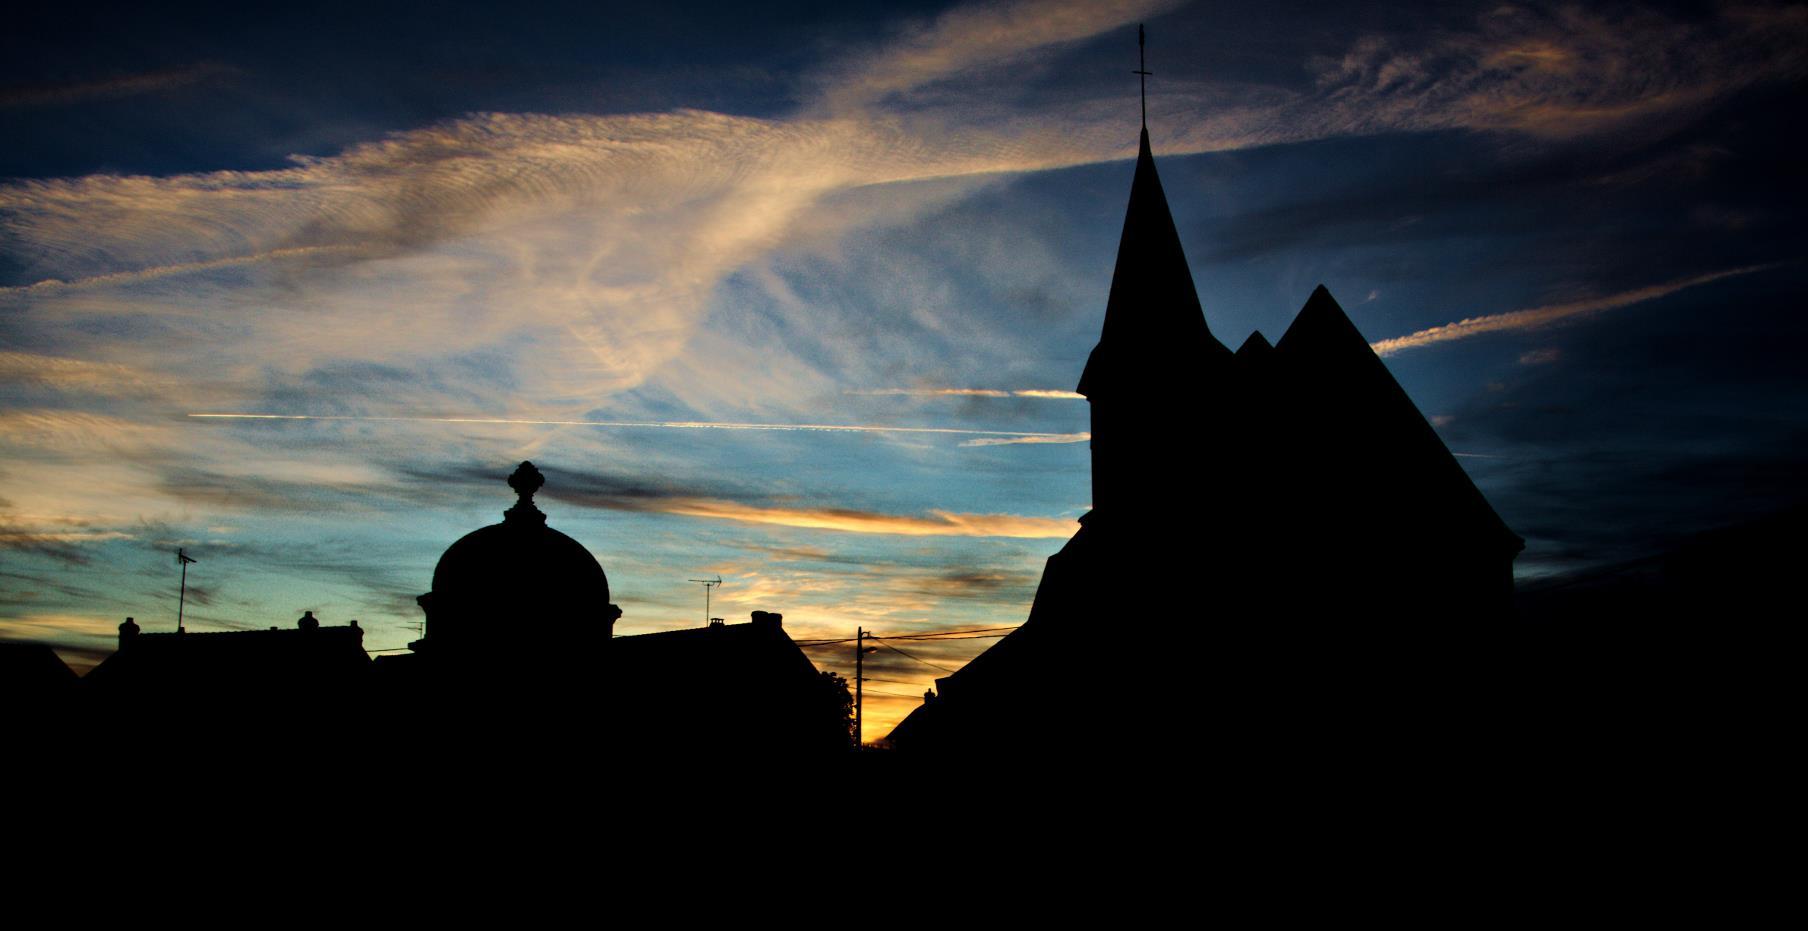 Zachód słońca nad kościołem i kaplicą w Thimory, okolica Montargis, Francja